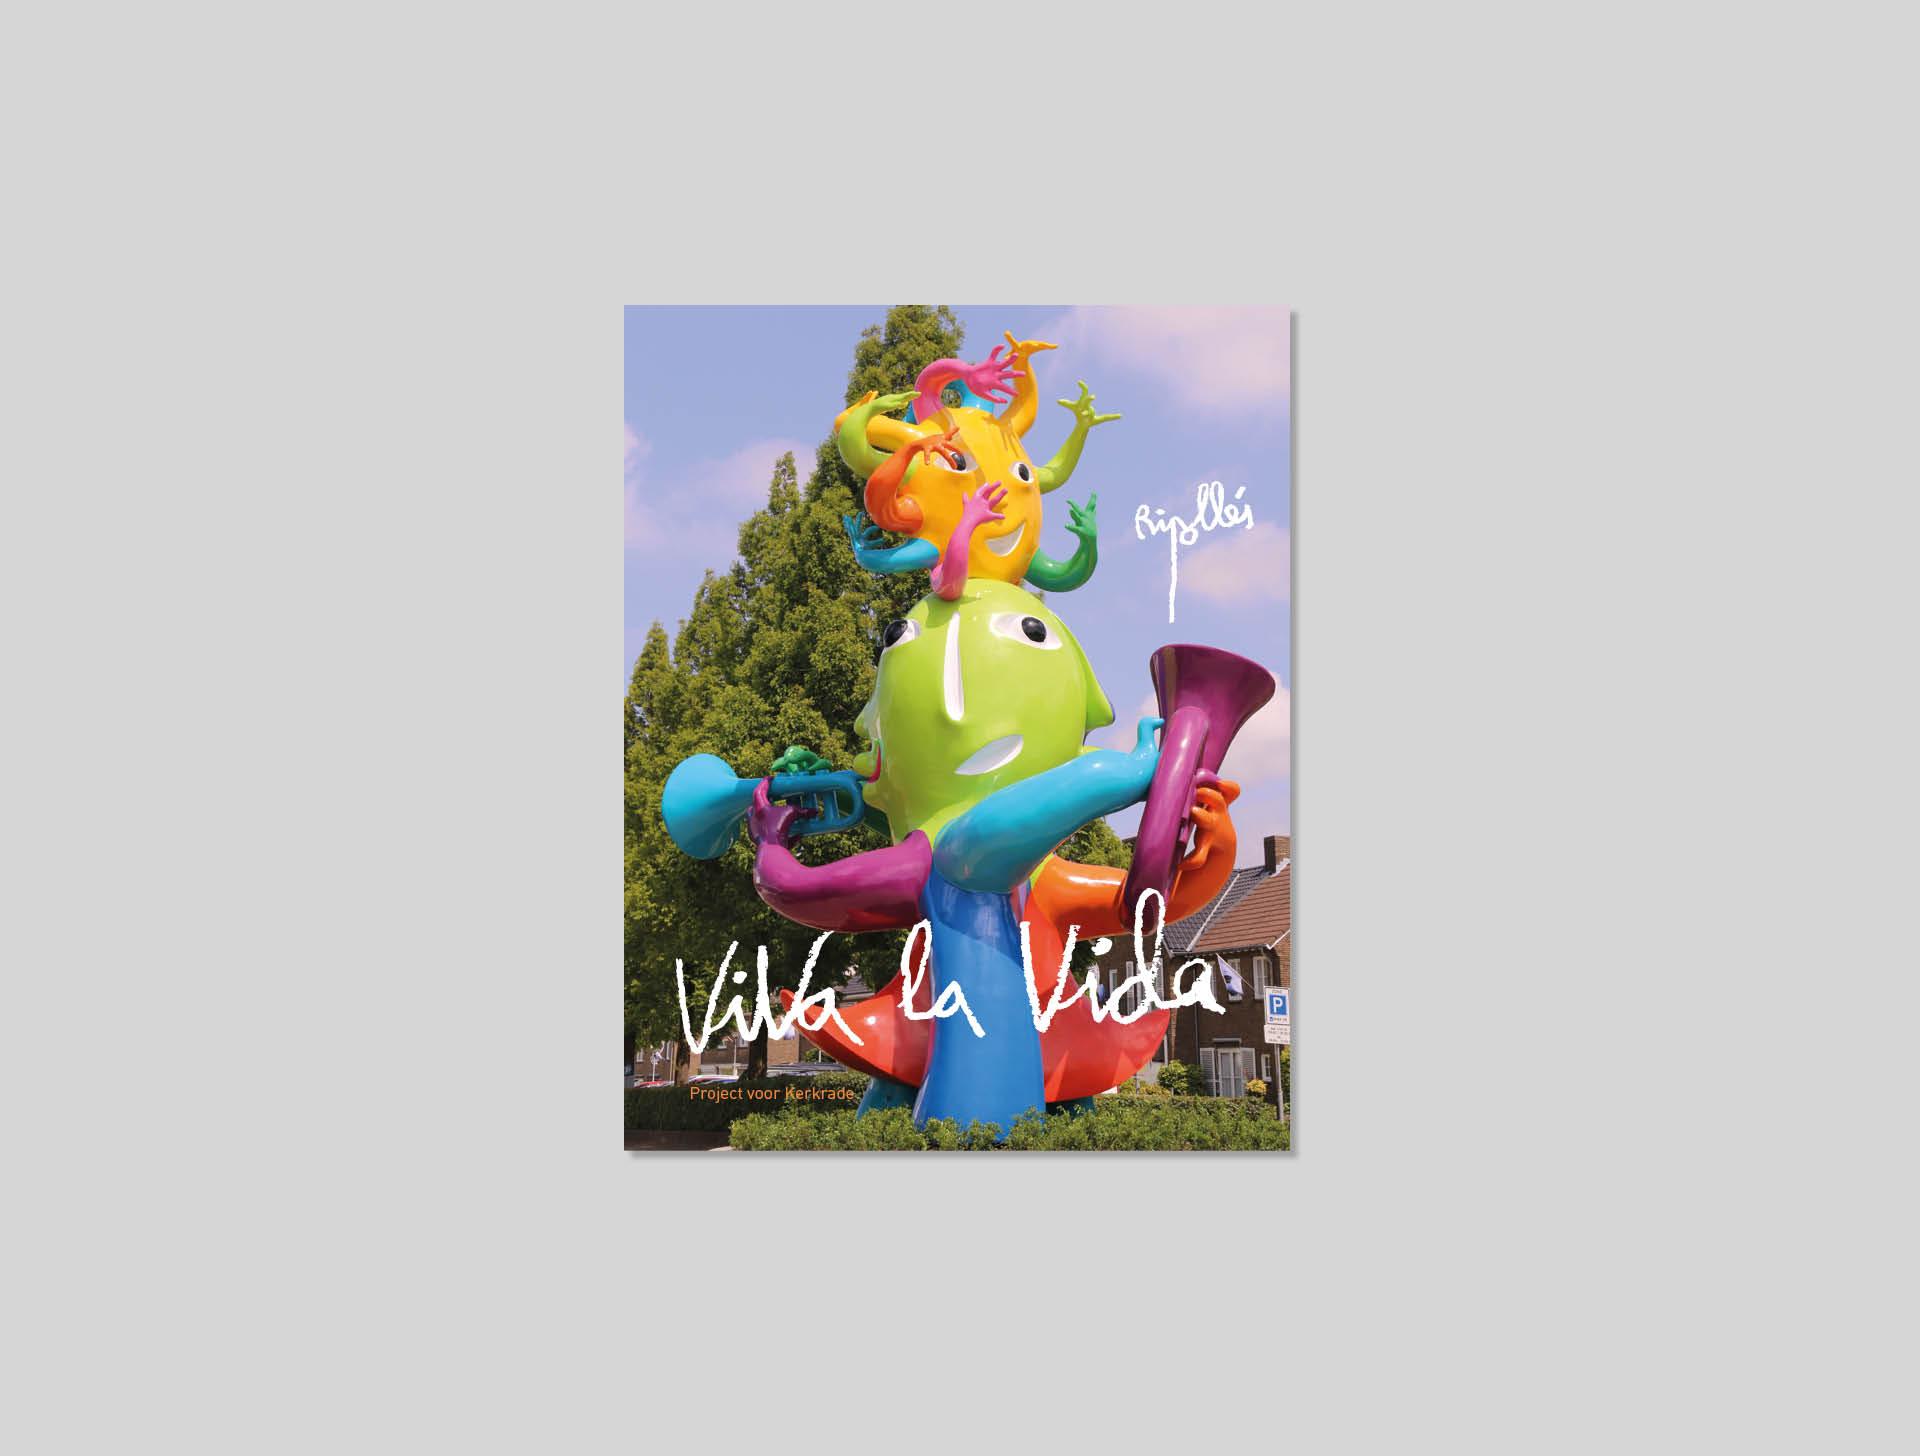 Ripolles - Viva La Vida - Ca Va Bien Design - Post + Garcia